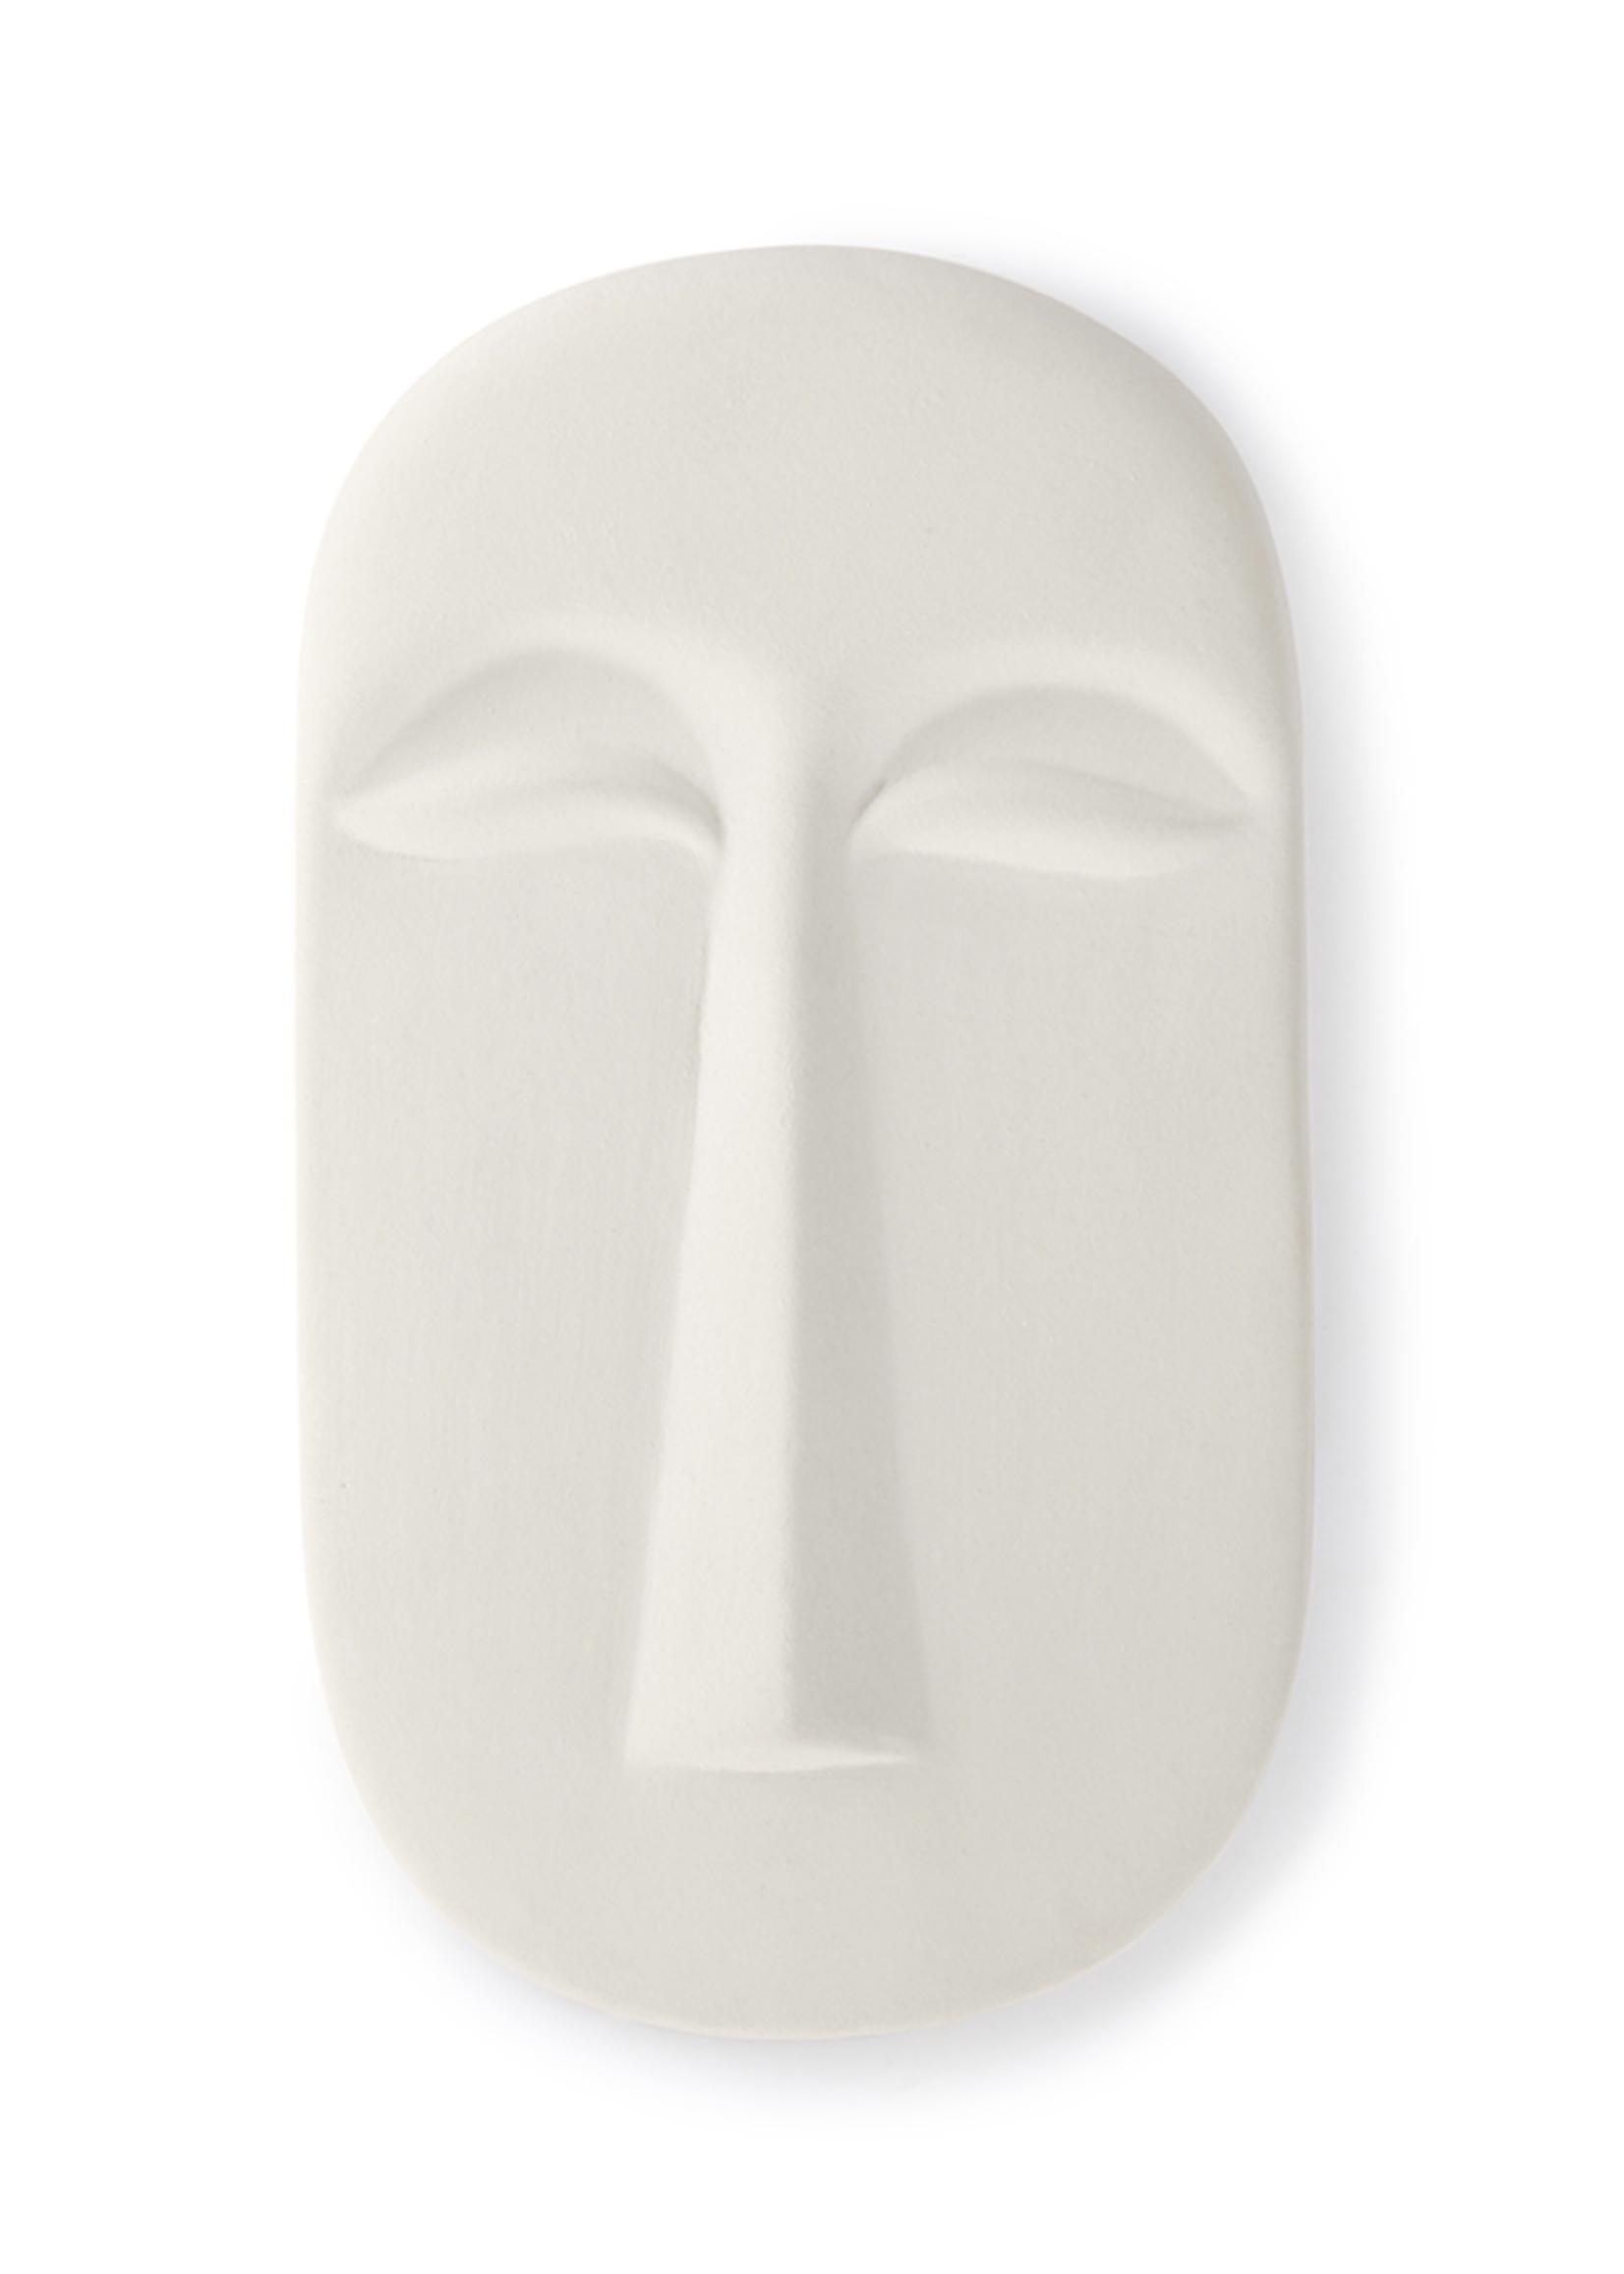 HKliving HK living mask wall ornament L matt white